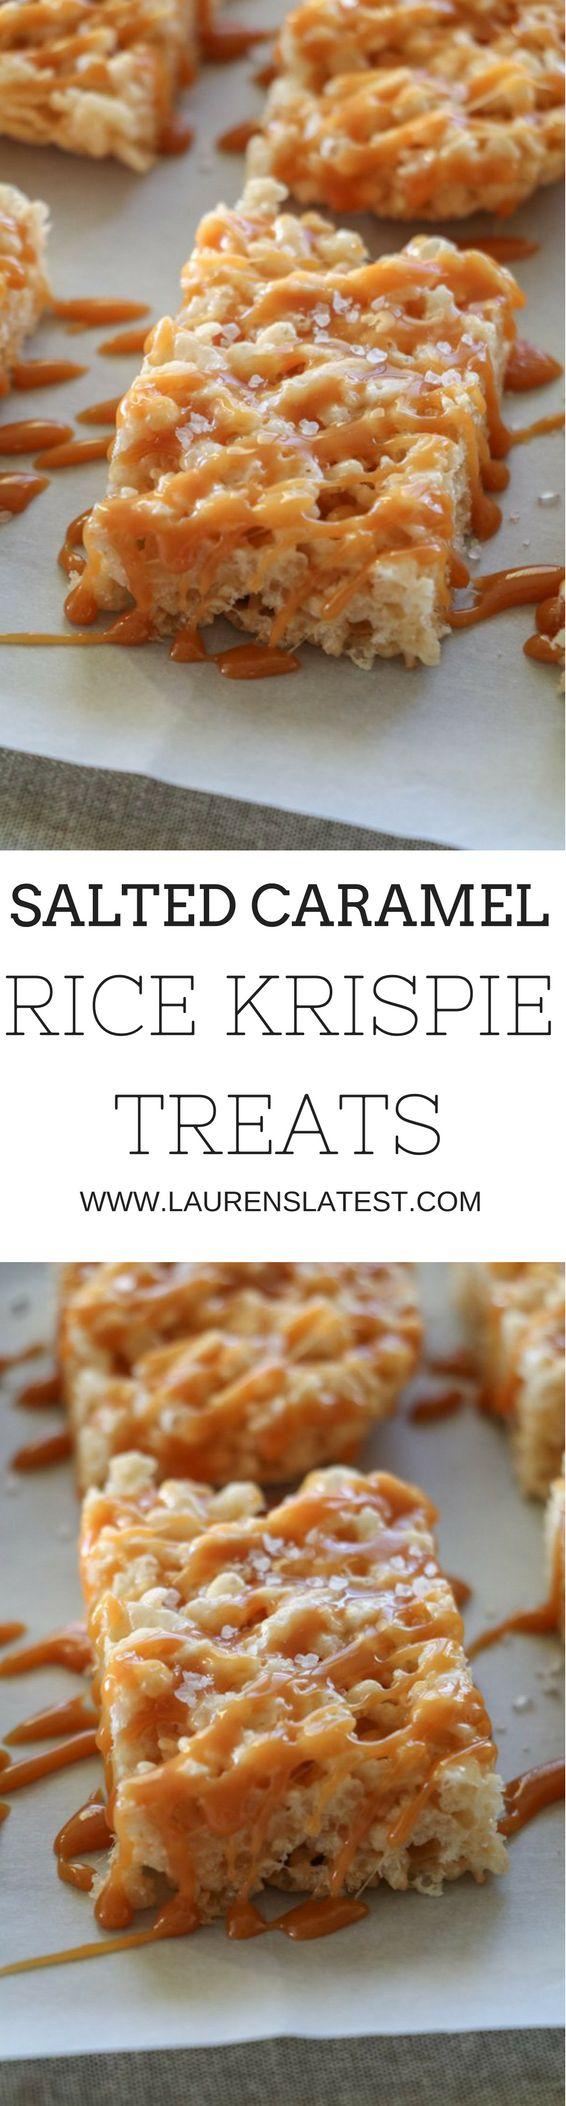 Salted Caramel Rice Krispie Treats...15 minutes to dessert time!